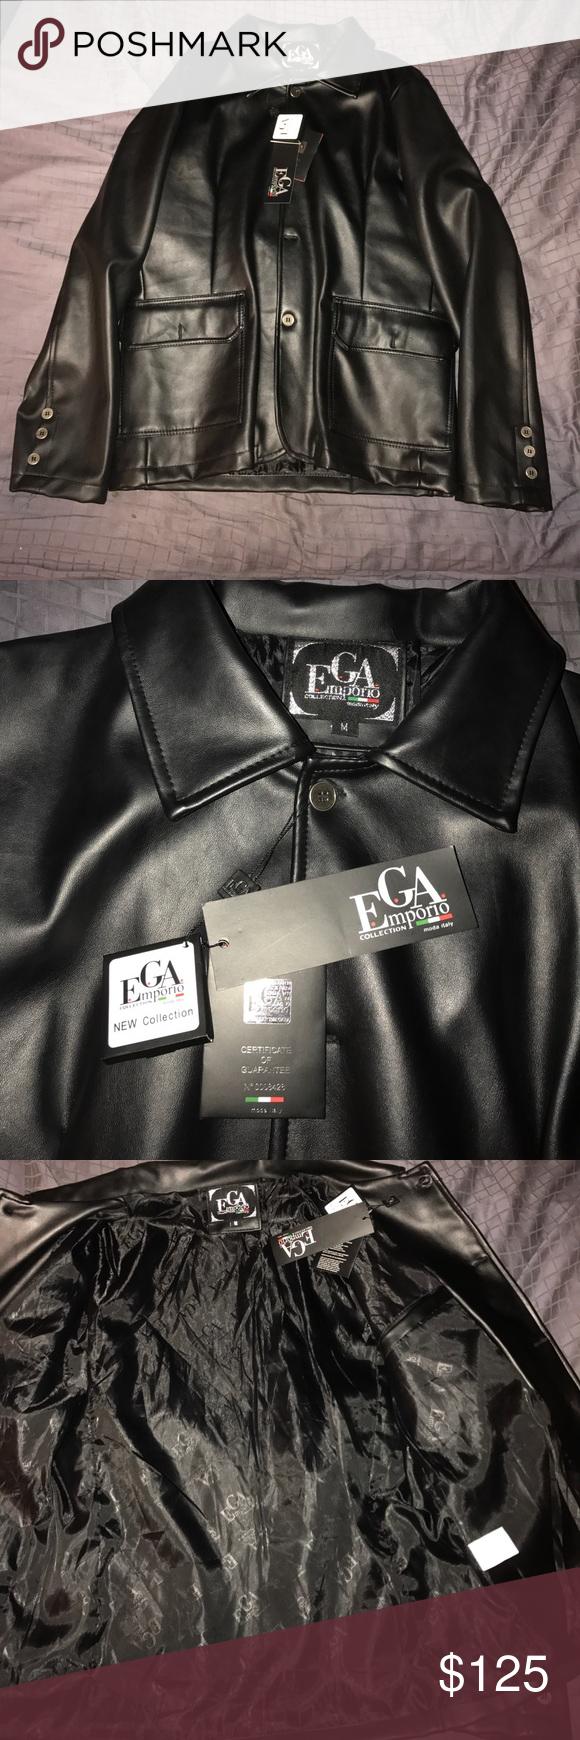 EGA Emporio Collection Men's Real Leather Jacket NWT